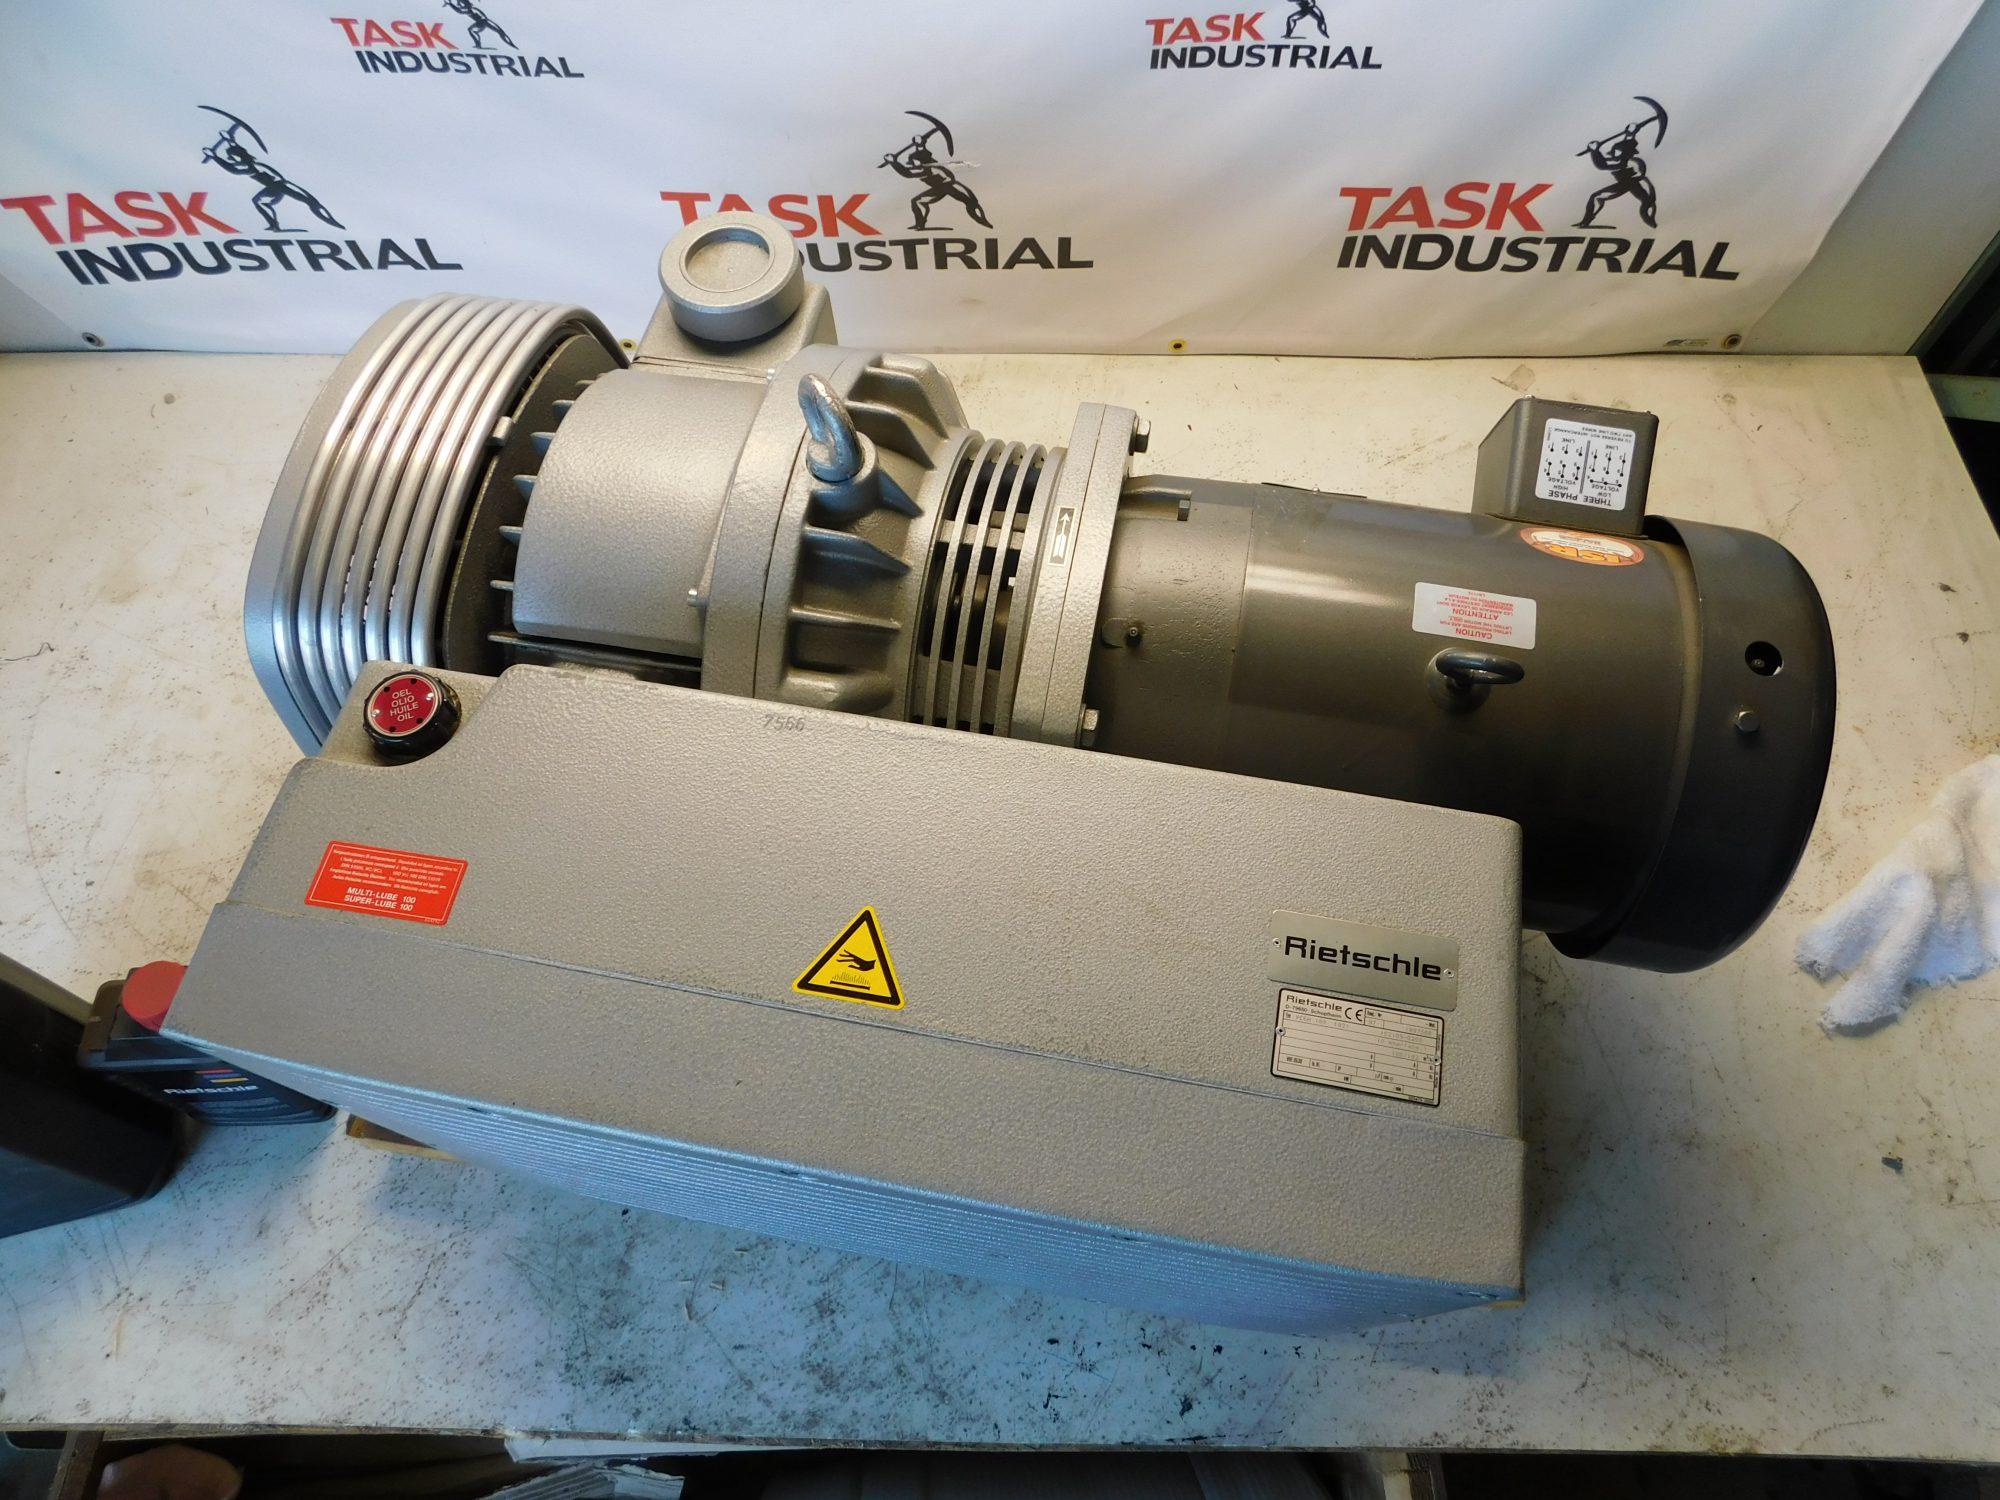 Thomas Rietschle Vacuum Pump VCEH 160 7.5HP, 1725RPM, 213TC Frame